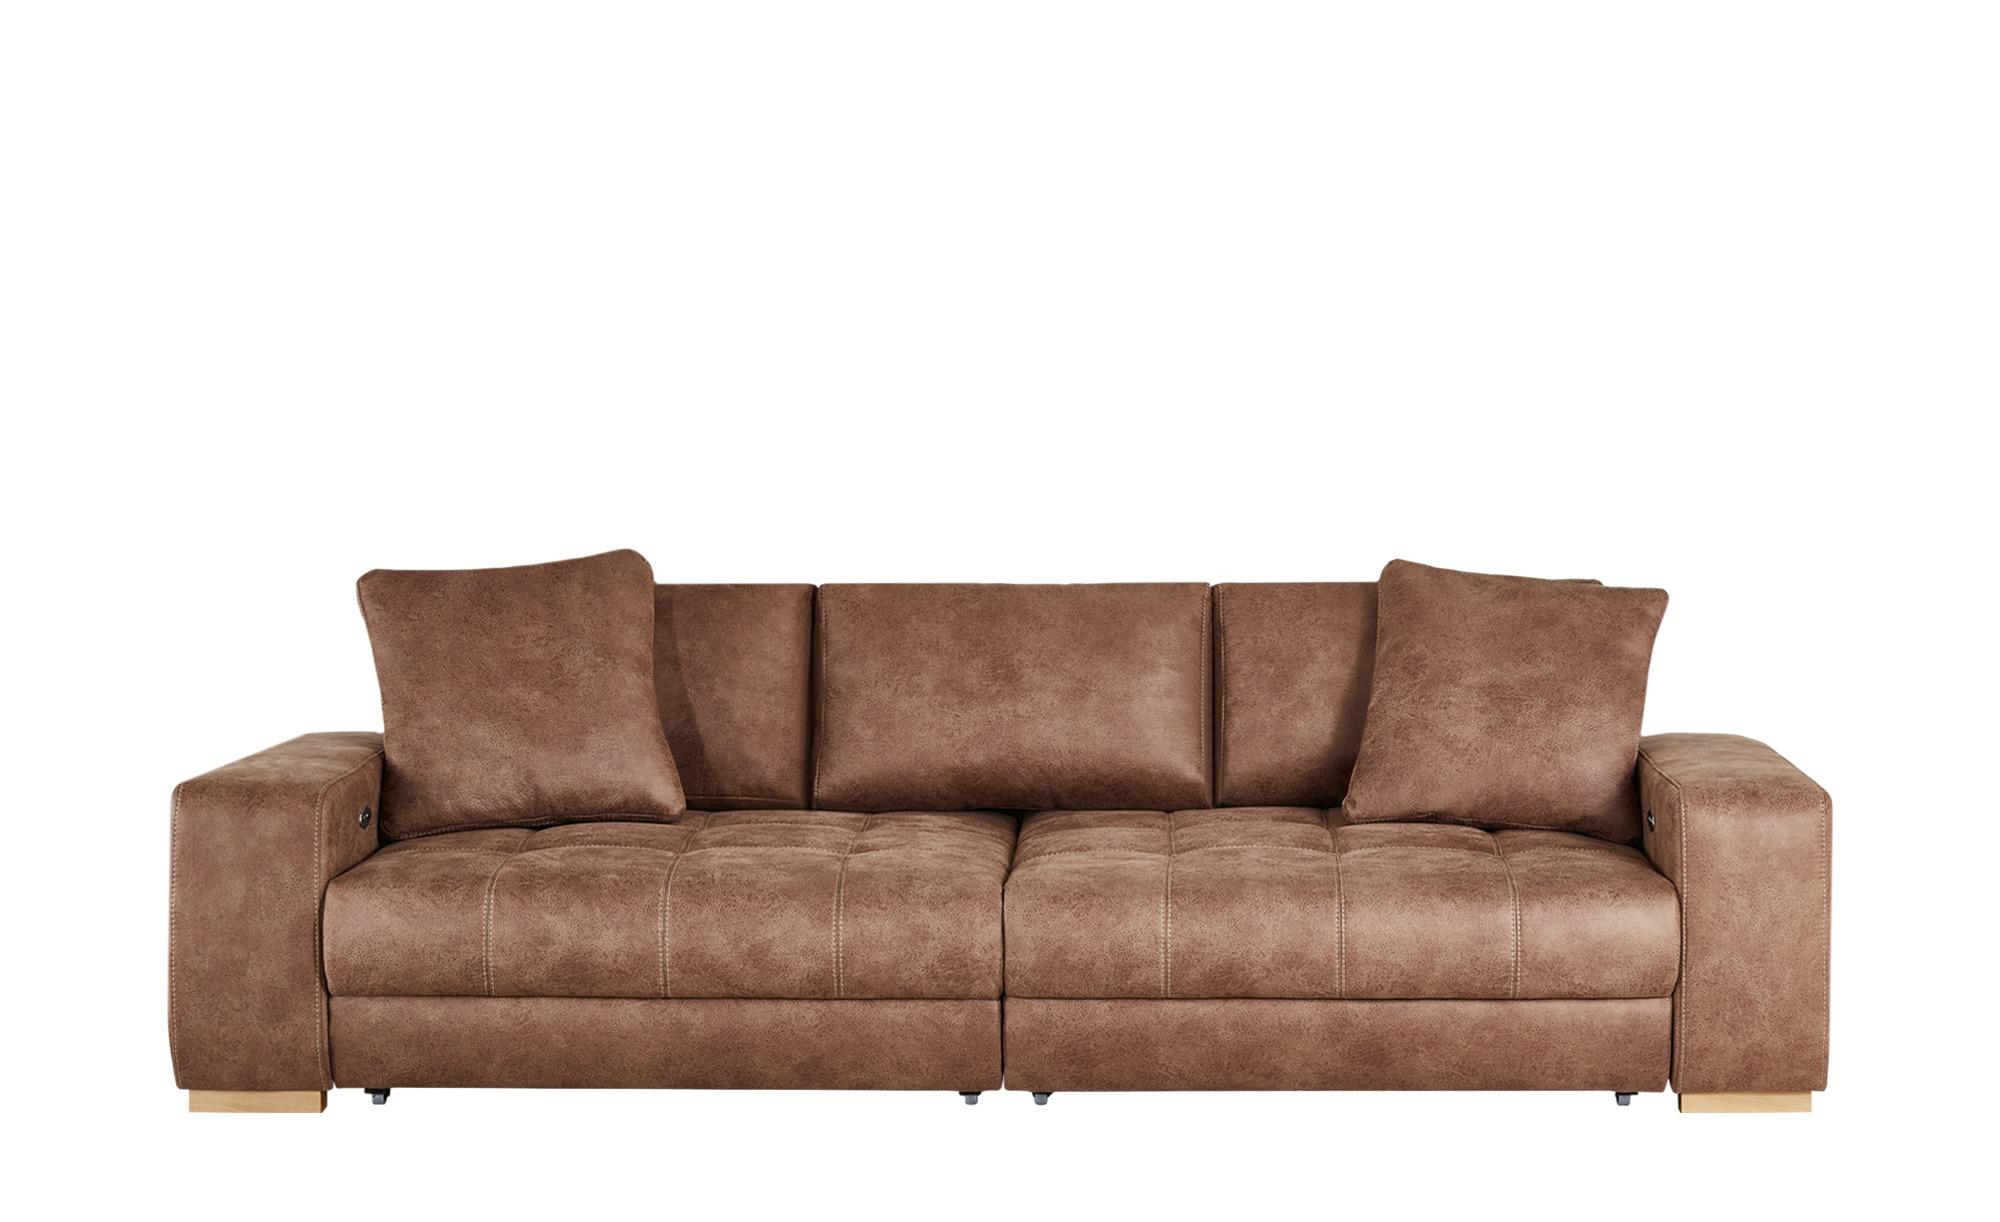 bobb Big Sofa cognac - Microfaser Caro ¦ braun ¦ Maße (cm): B: 302 H: 68 T: 136 Polstermöbel > Sofas > Big-Sofas - Höffner